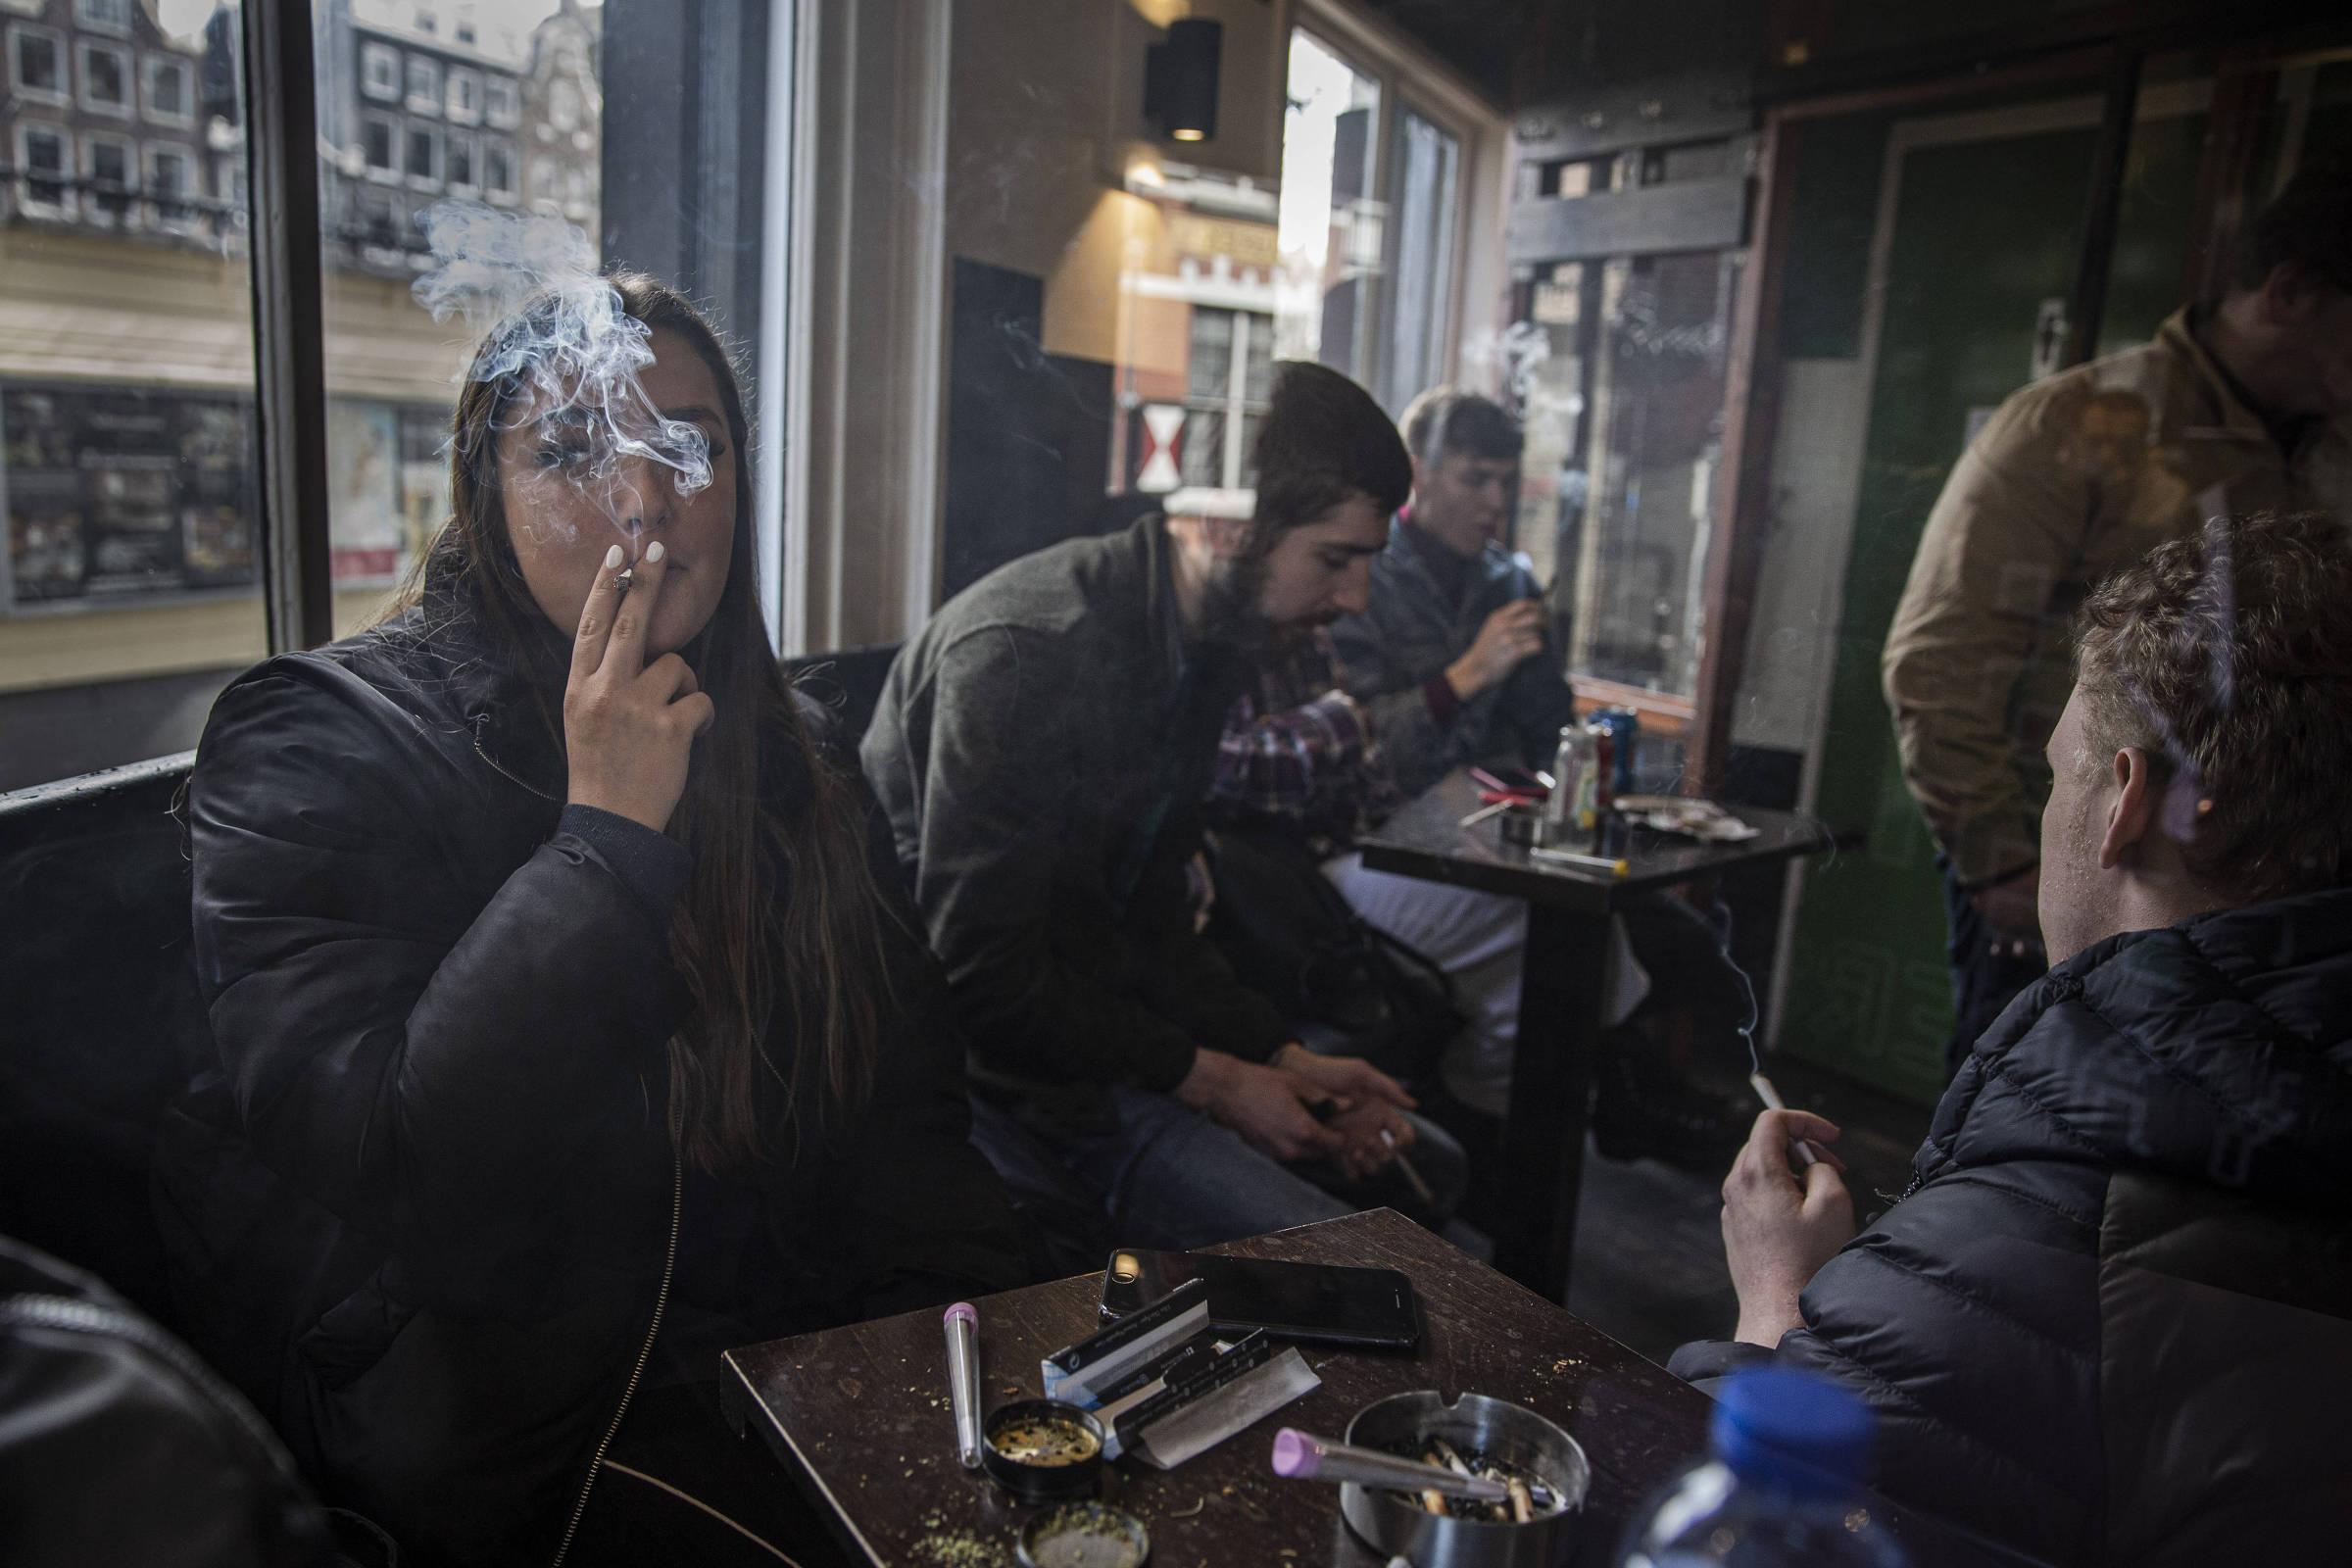 Jovens fumam maconha no centro de Amsterdã (acima) e no cofffeeshop Voyagers